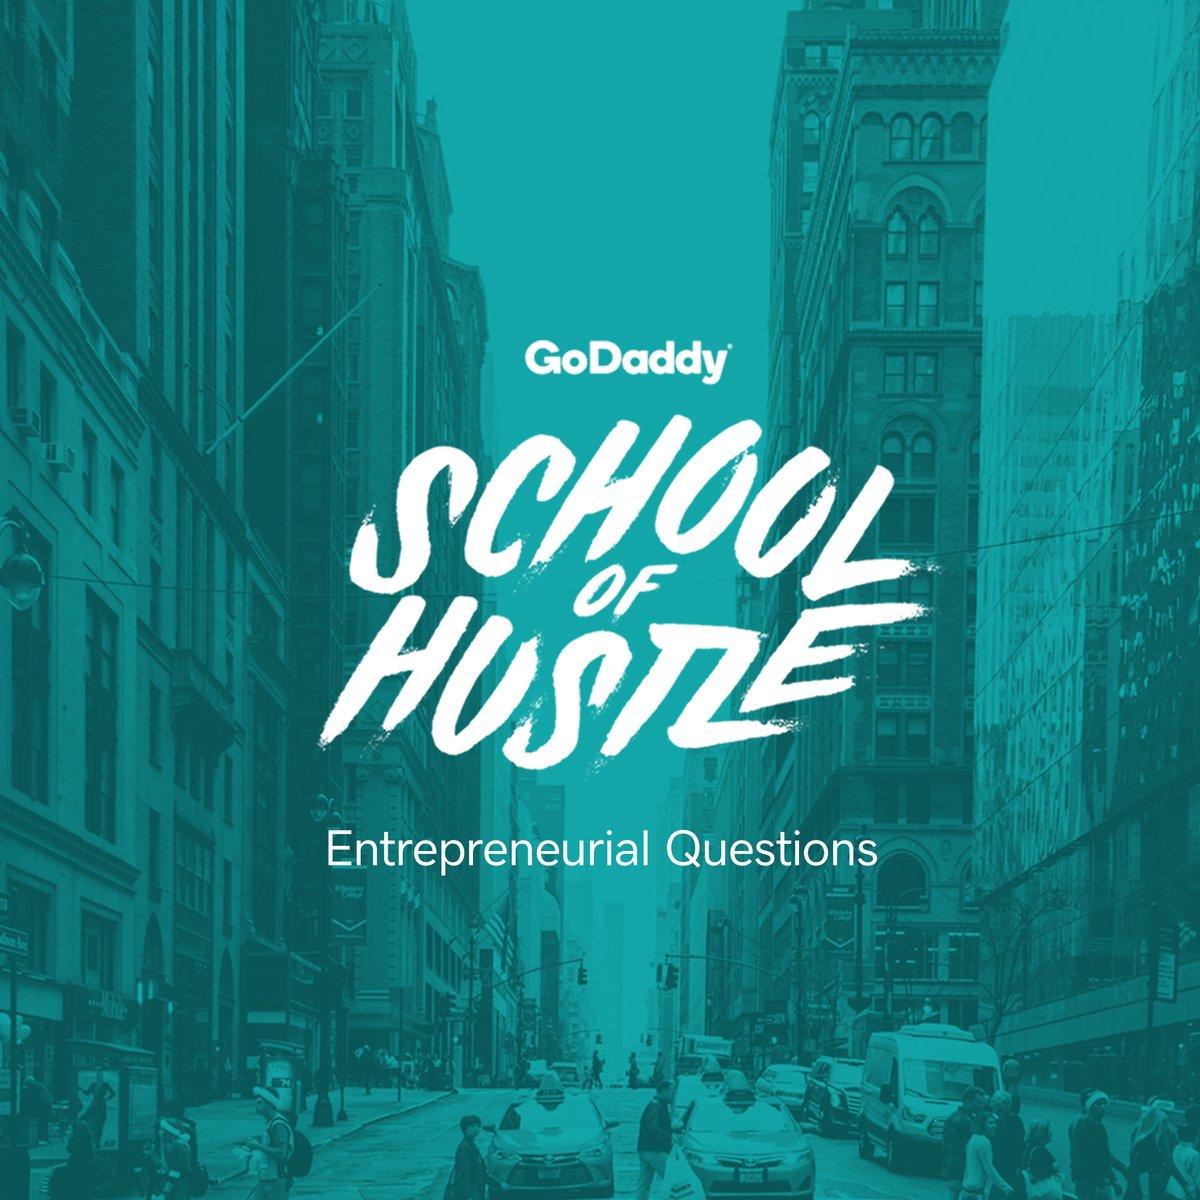 12-year-old entrepreneur Jordana Slapo is on School of Hustle chatting about her profitable shoe design business.